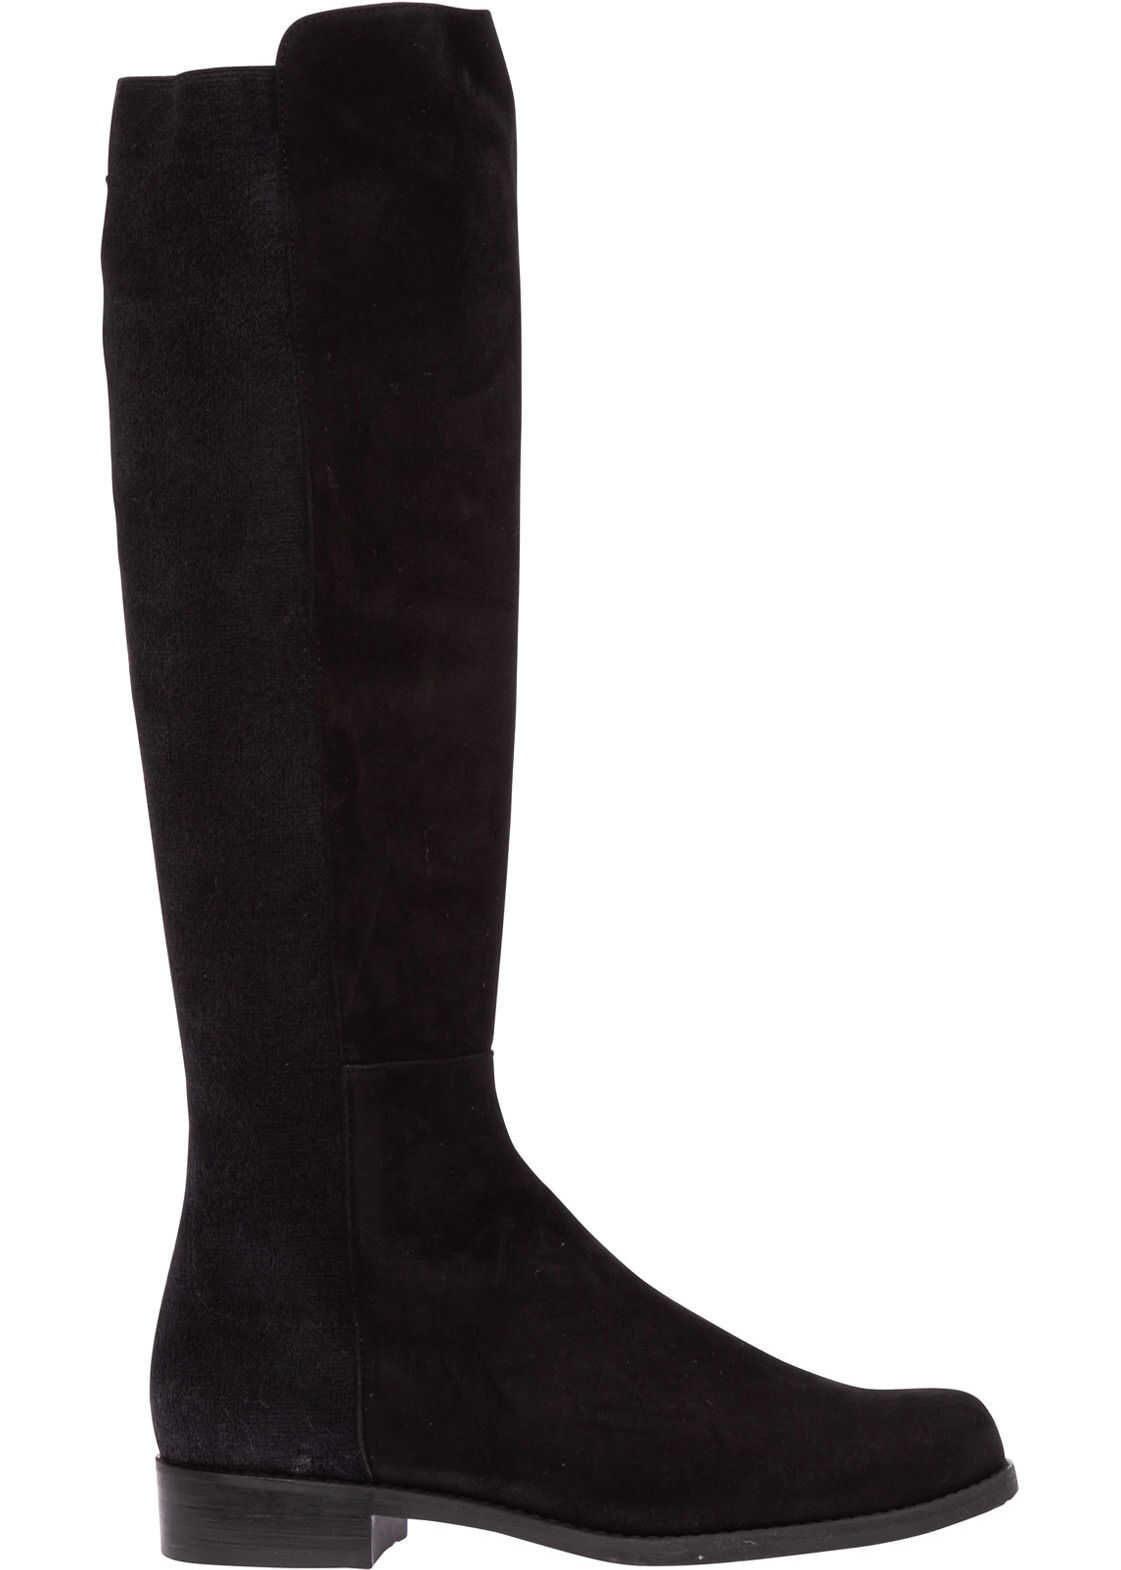 Stuart Weitzman Boots Halfnhalf Black